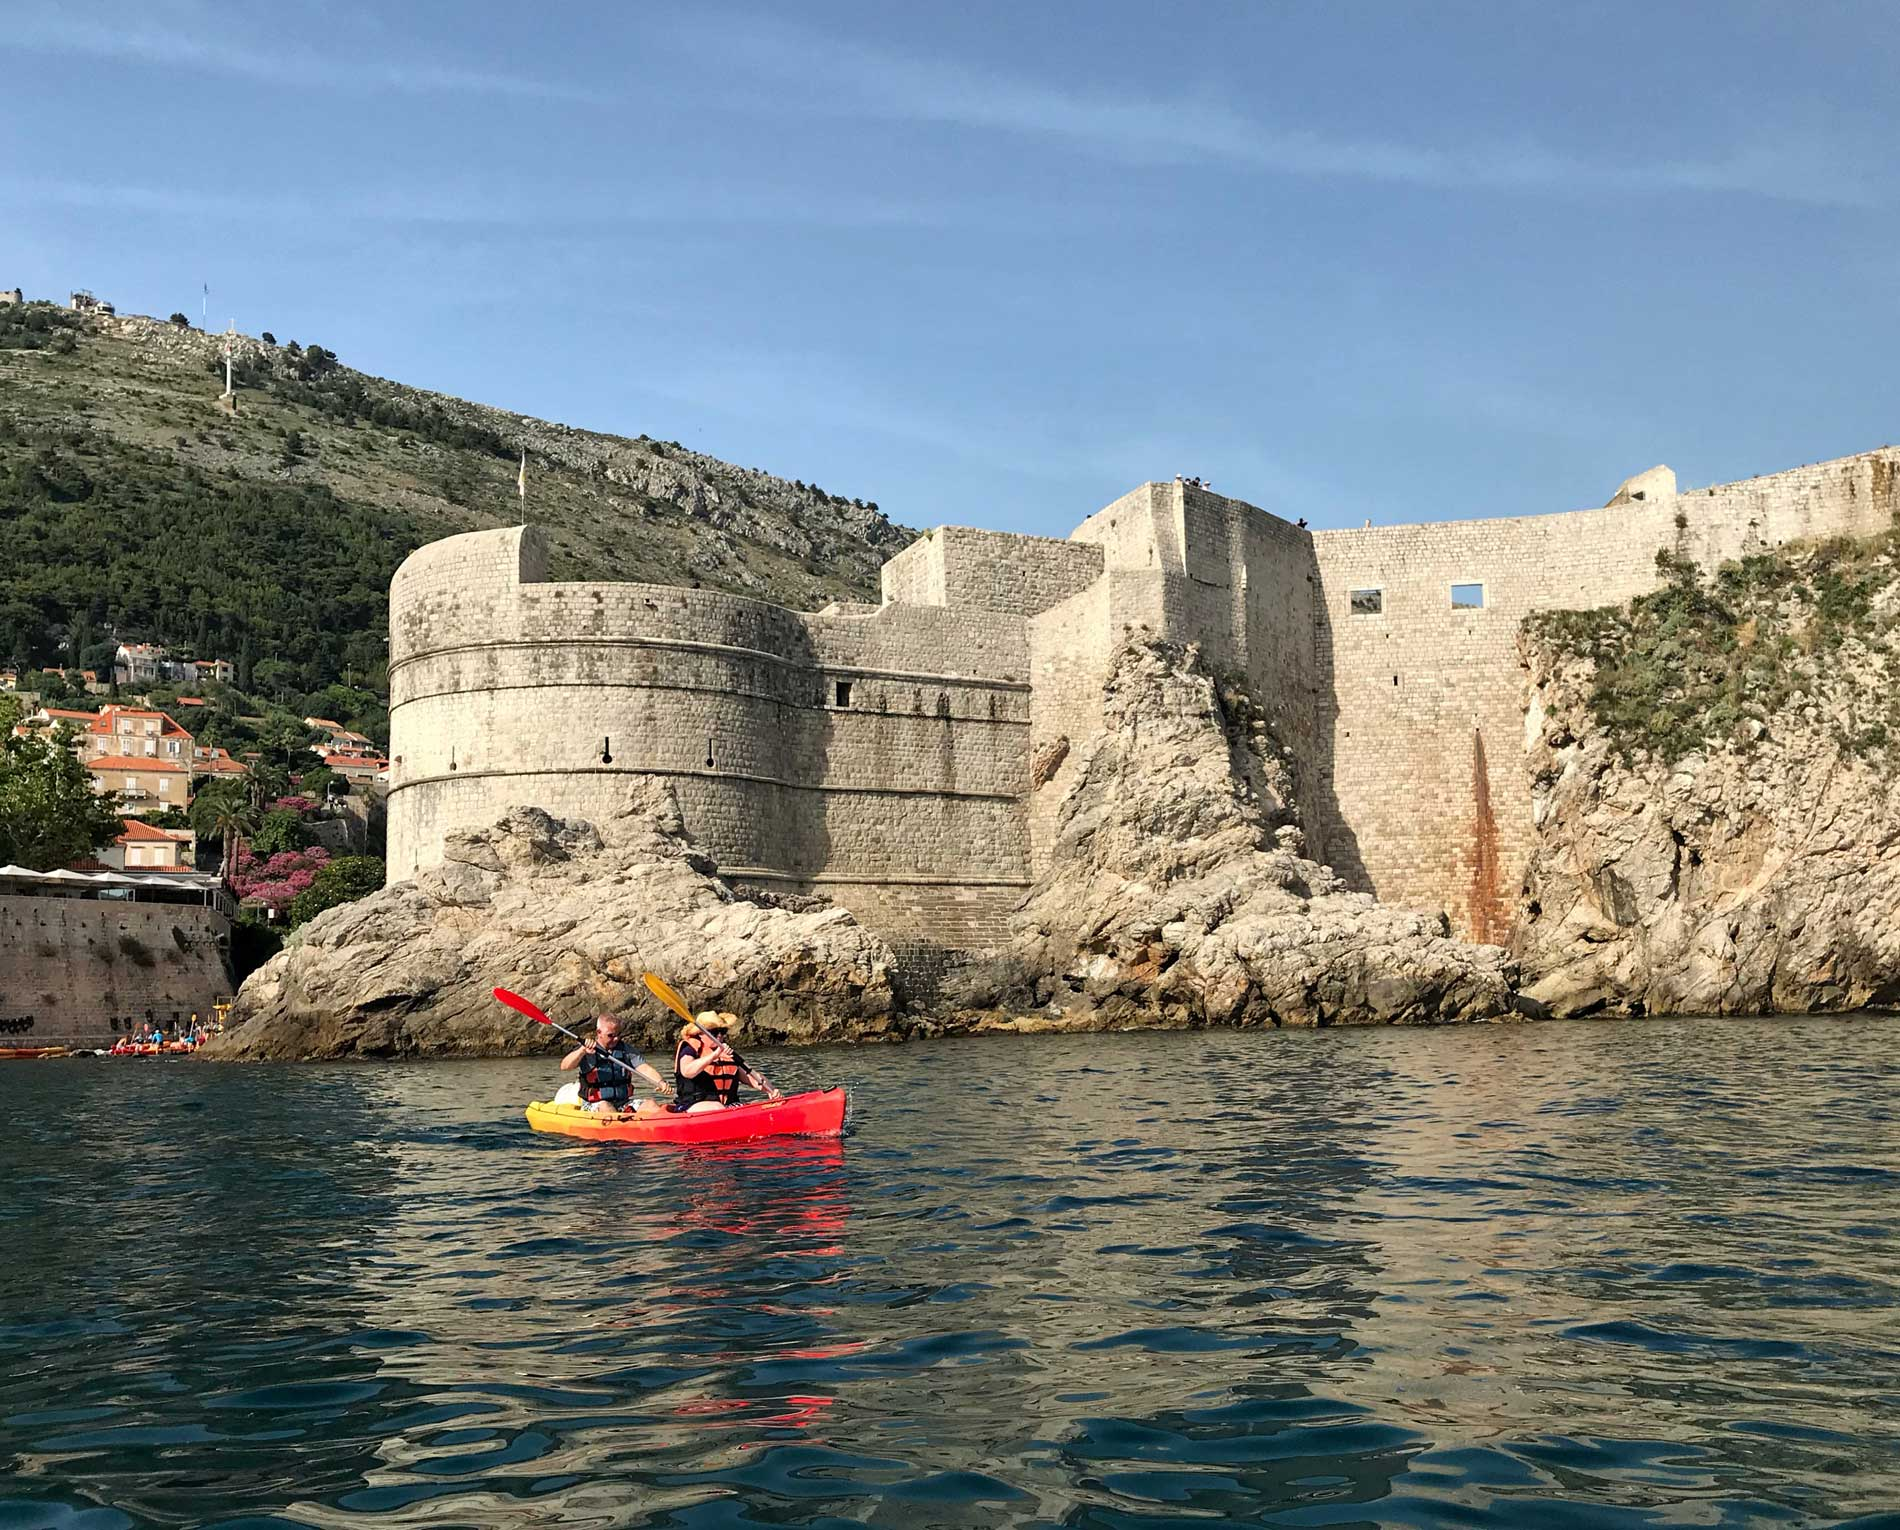 Dubrovnik-Croazia-kayak-adventure-Dubrovnik-Mura-bianche-Ragusa